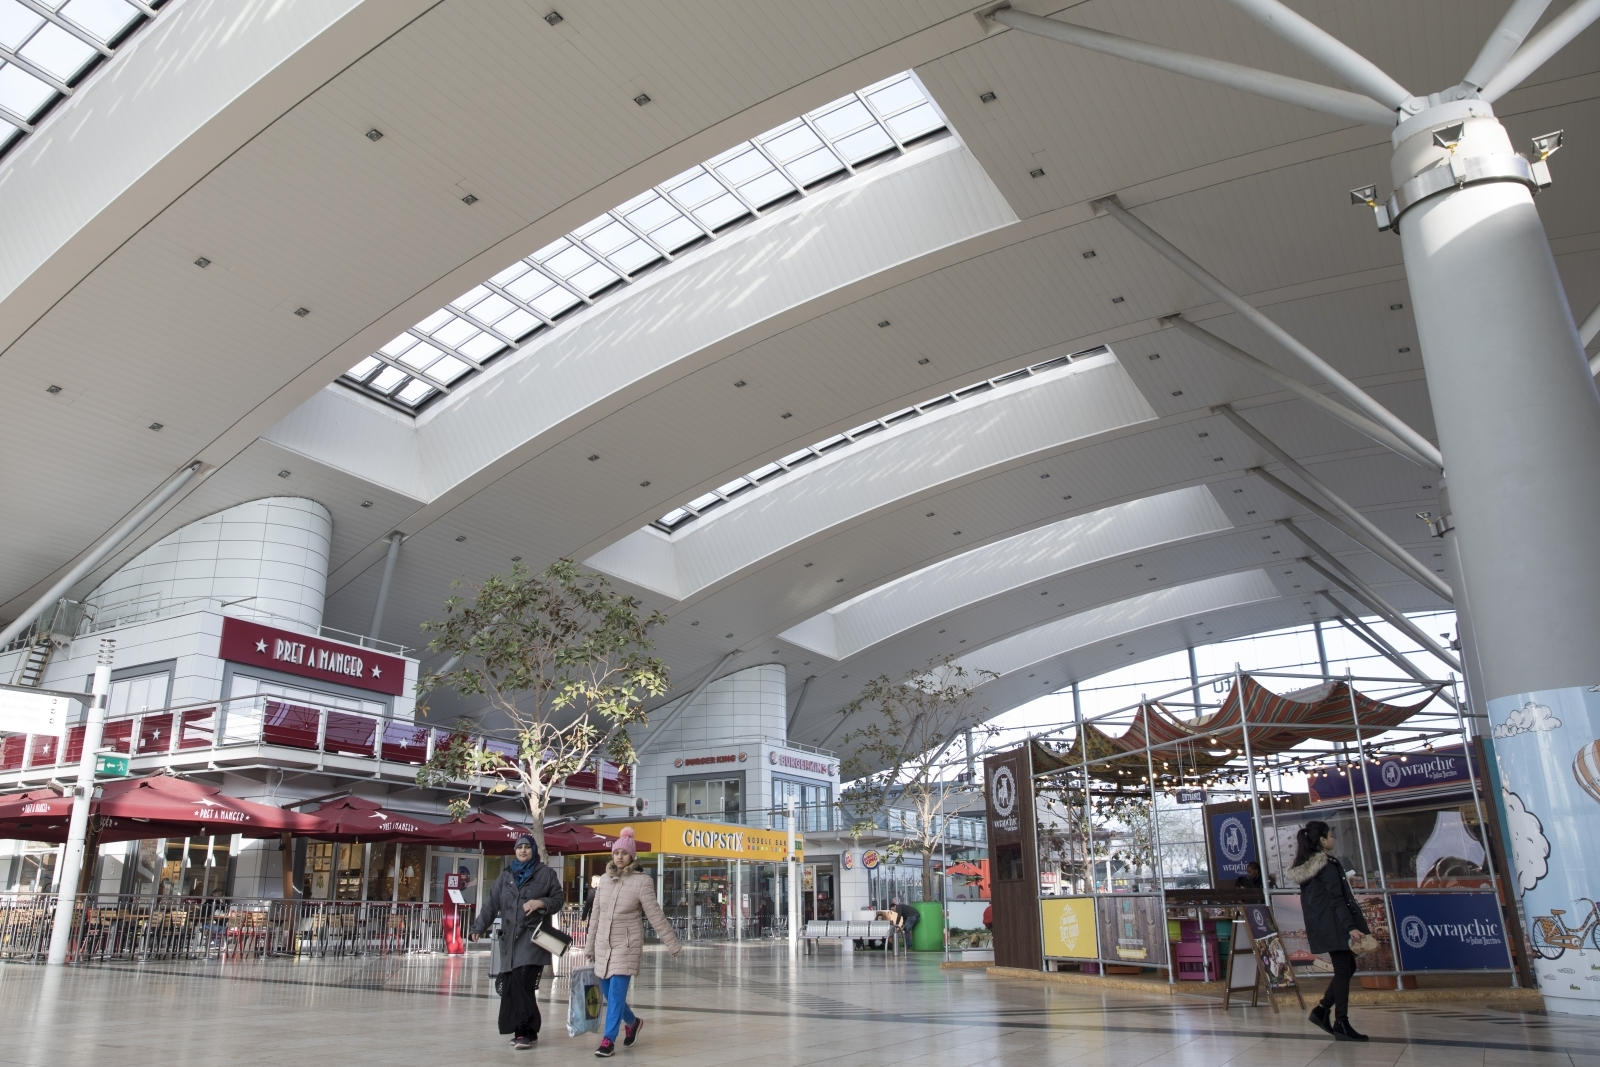 Milton Keynes intu shopping centre